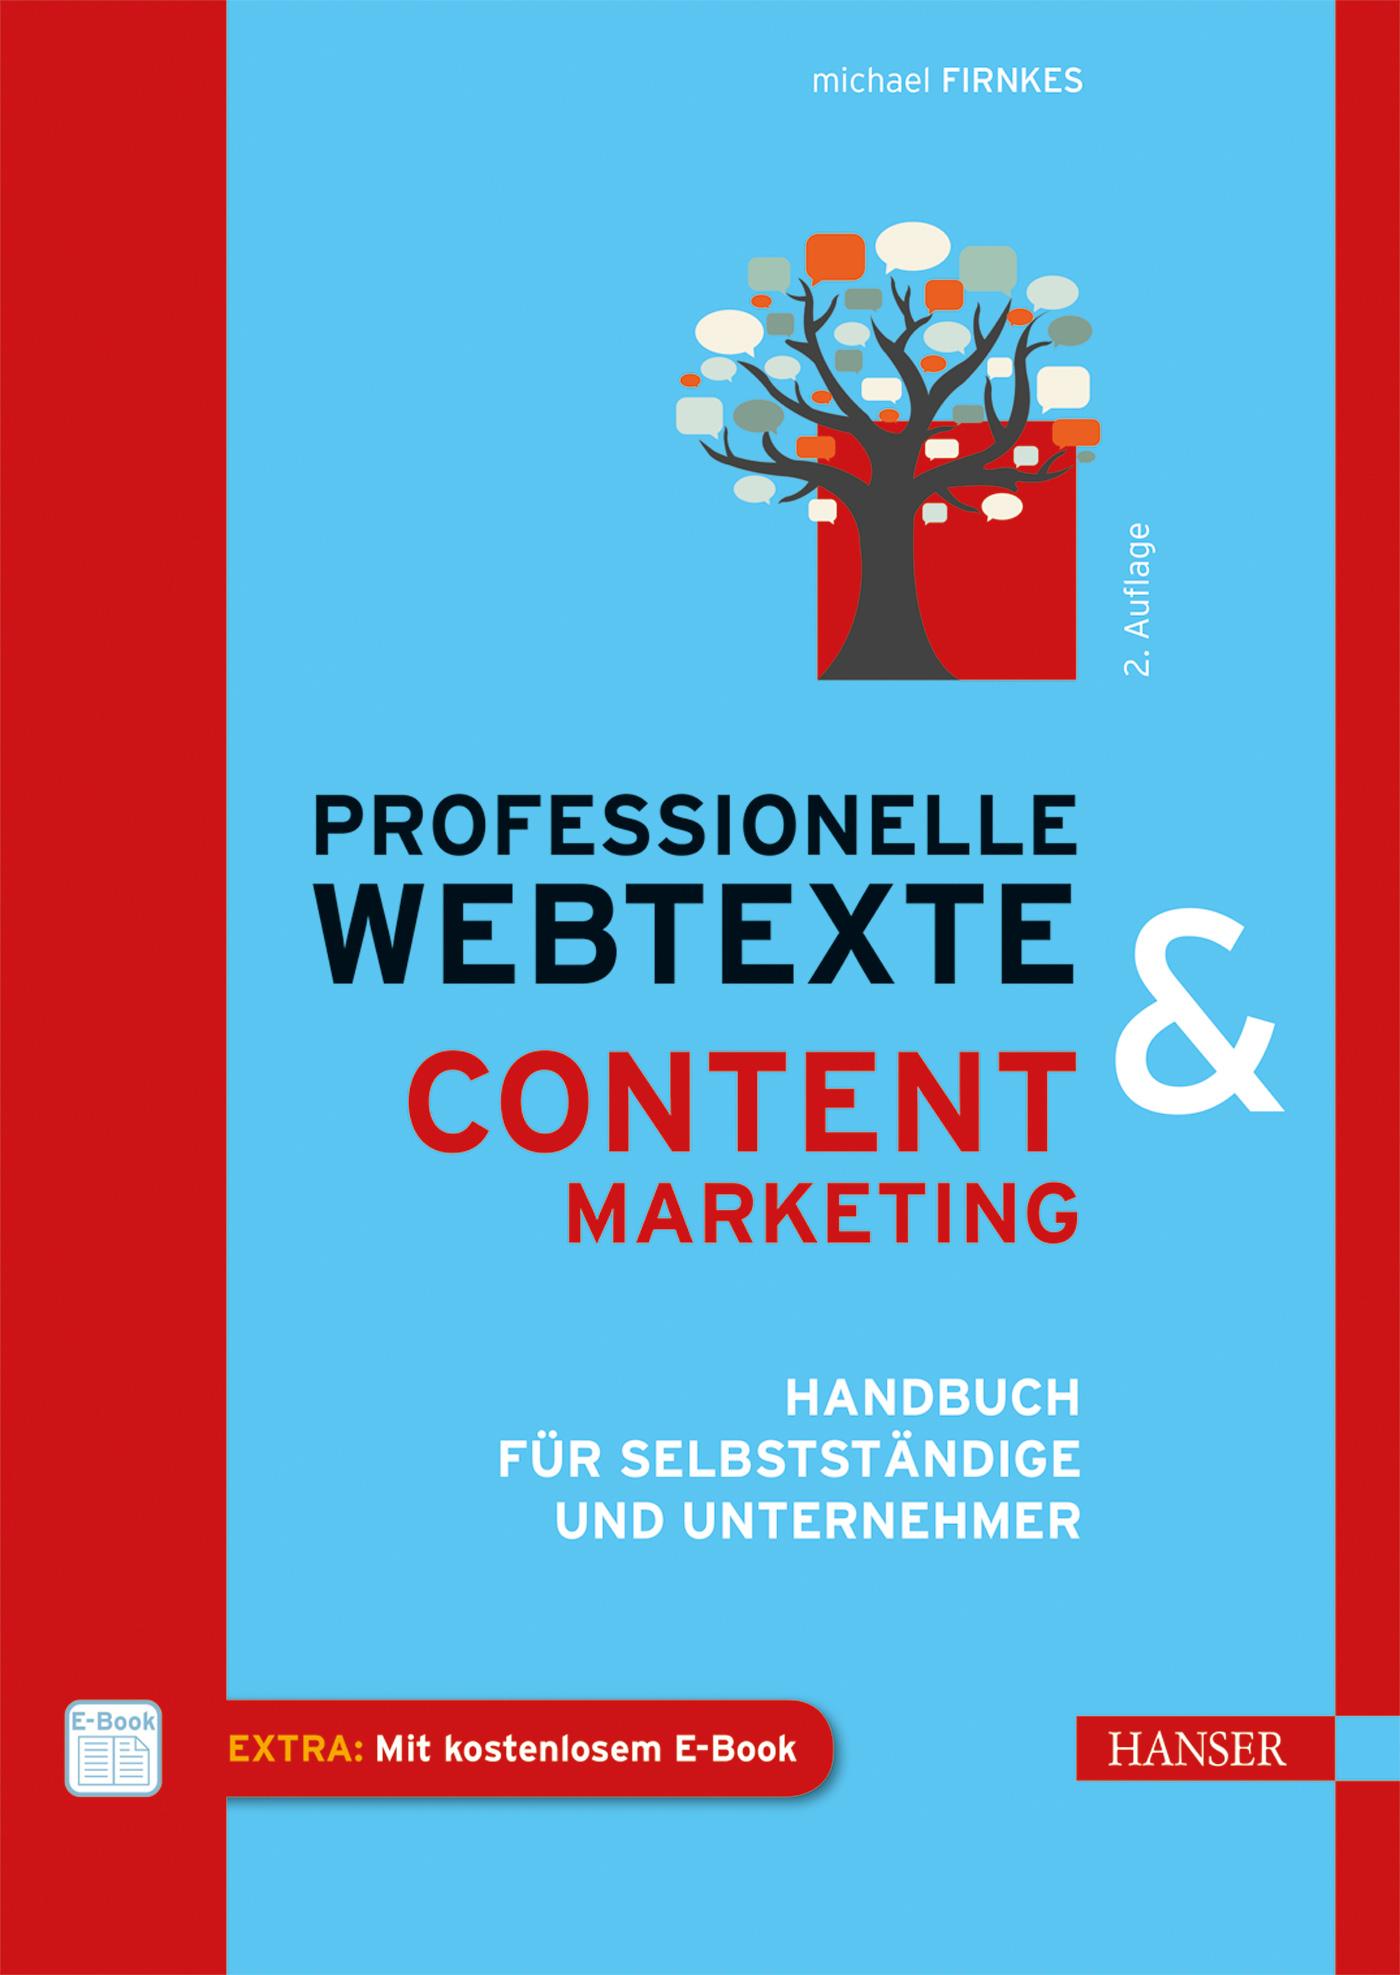 Professionelle Webtexte & Content Marketing: Ha...